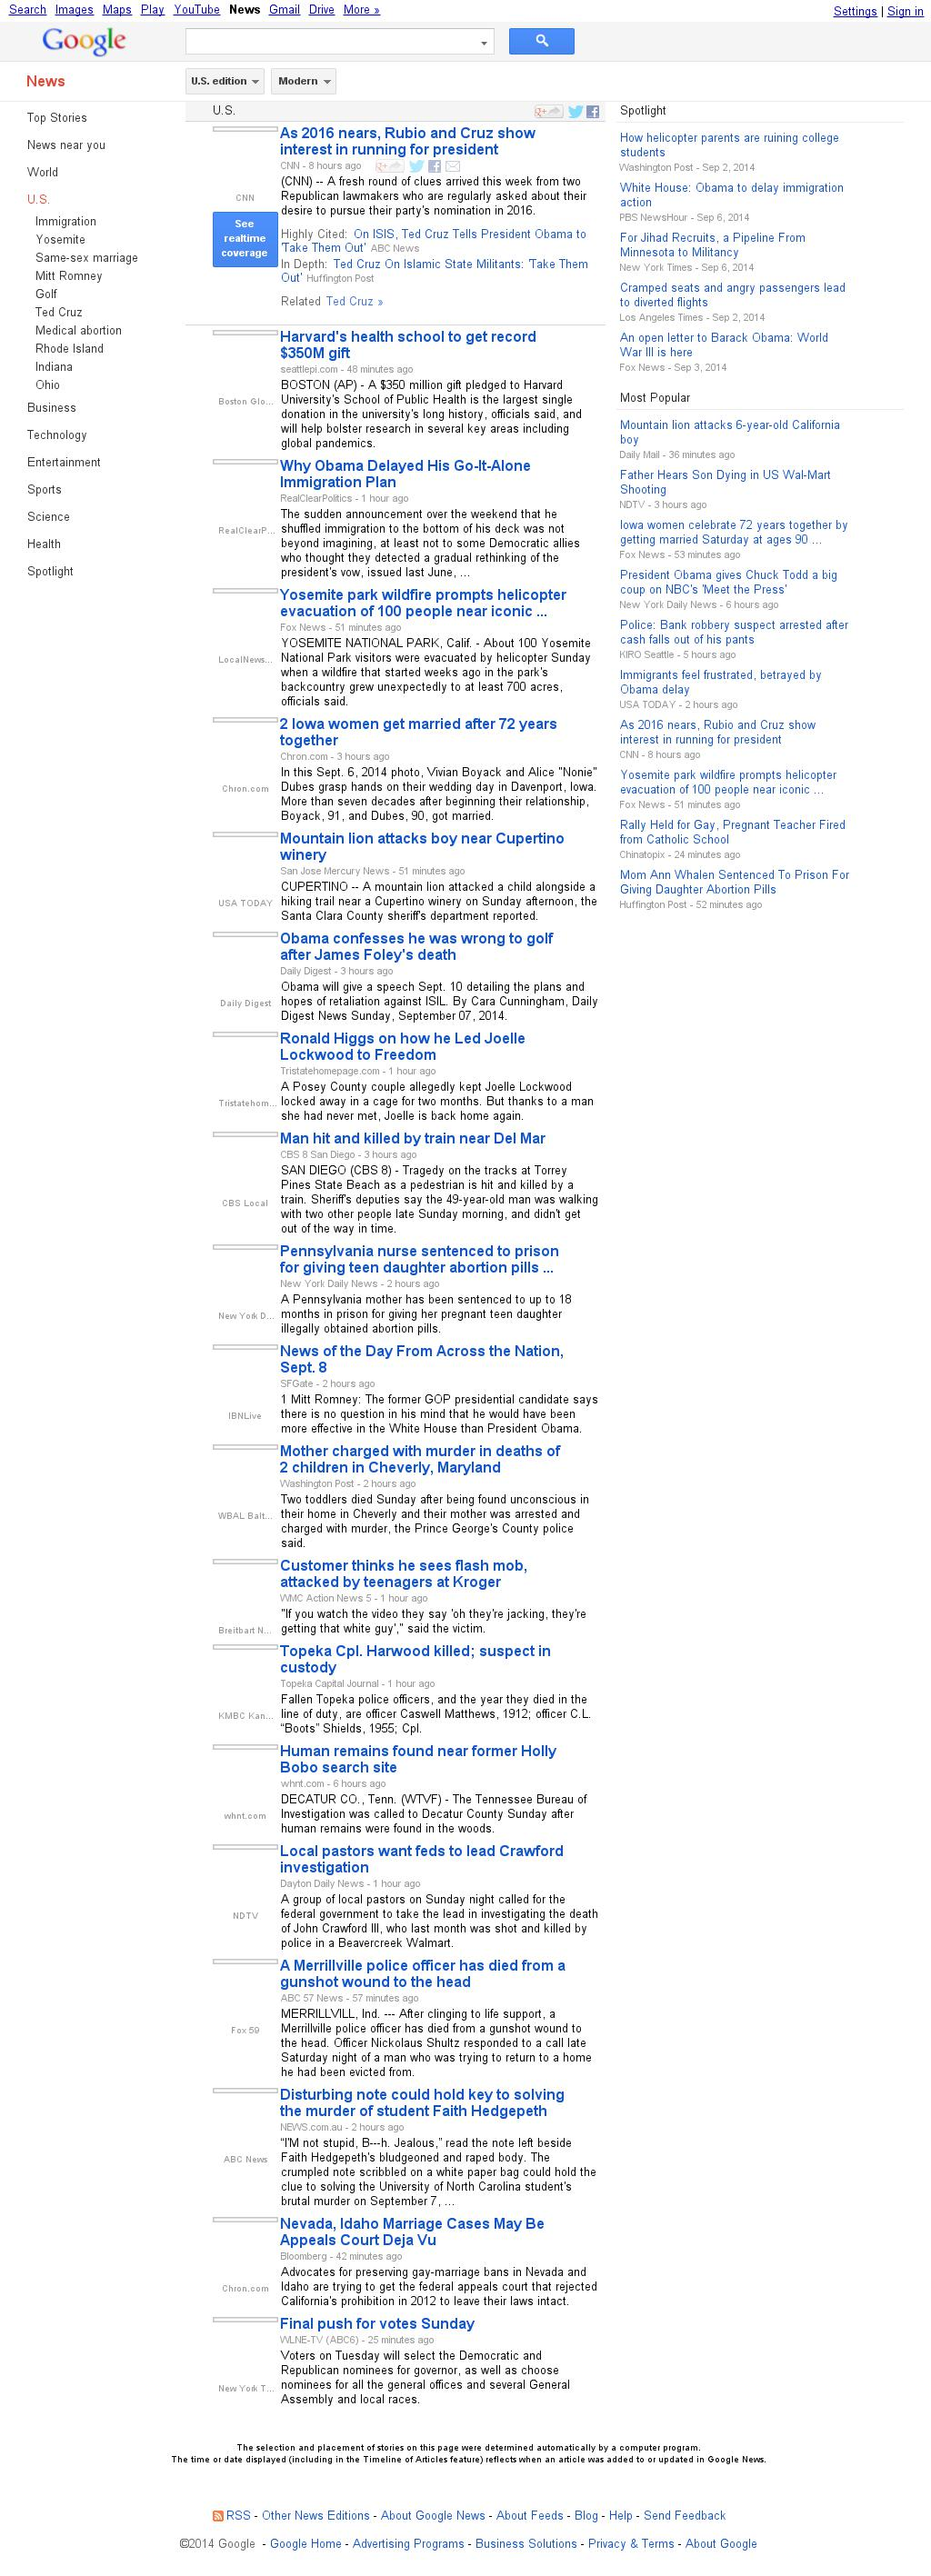 Google News: U.S. at Monday Sept. 8, 2014, 5:07 a.m. UTC